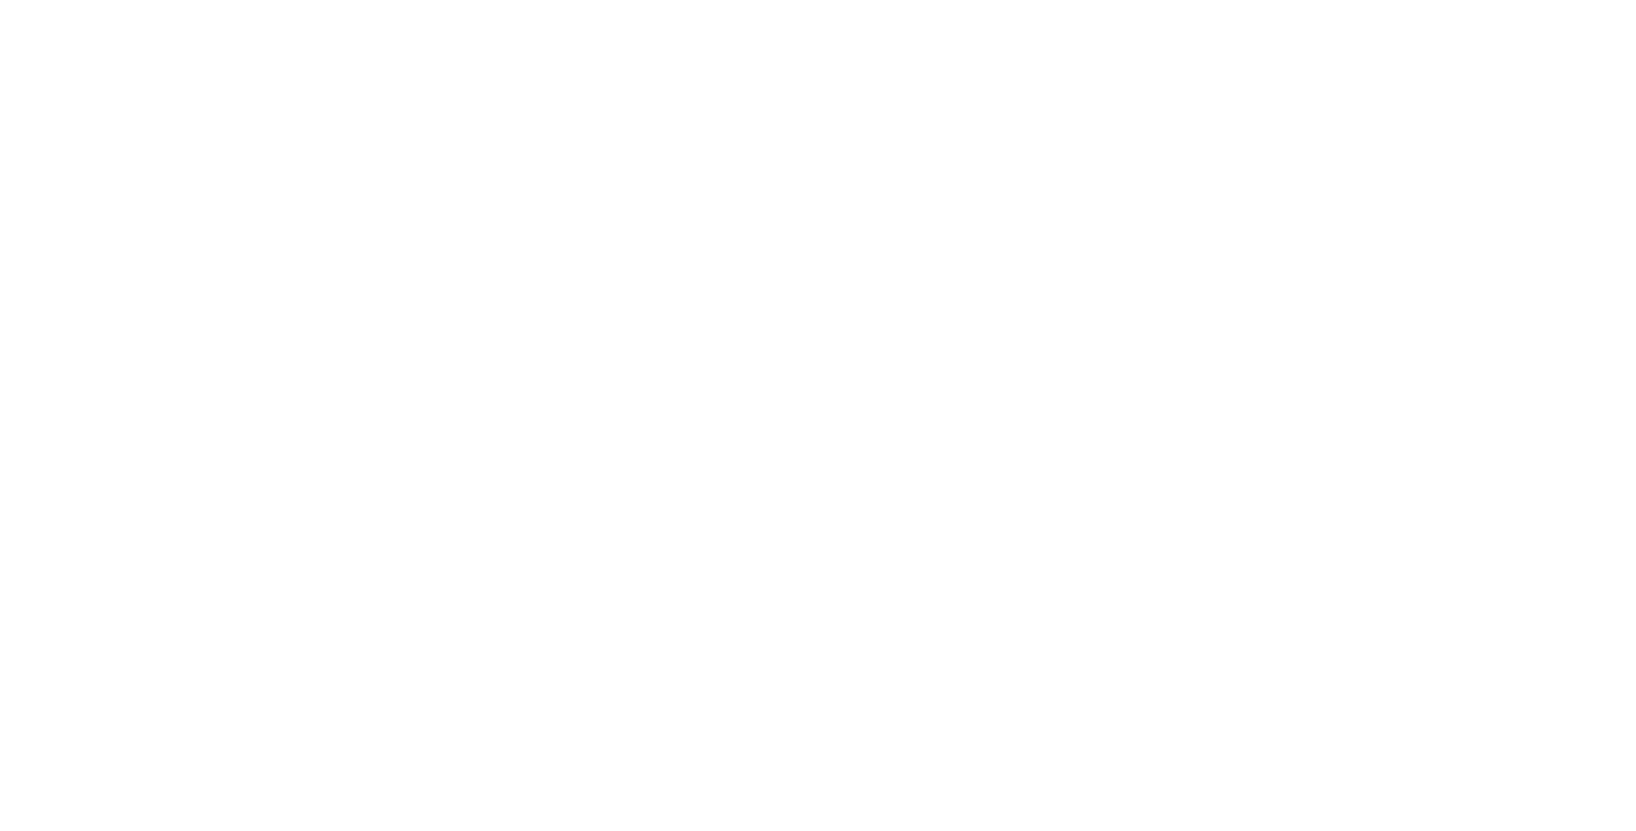 Logotipo-Funerária-Santa-Maria-Branco